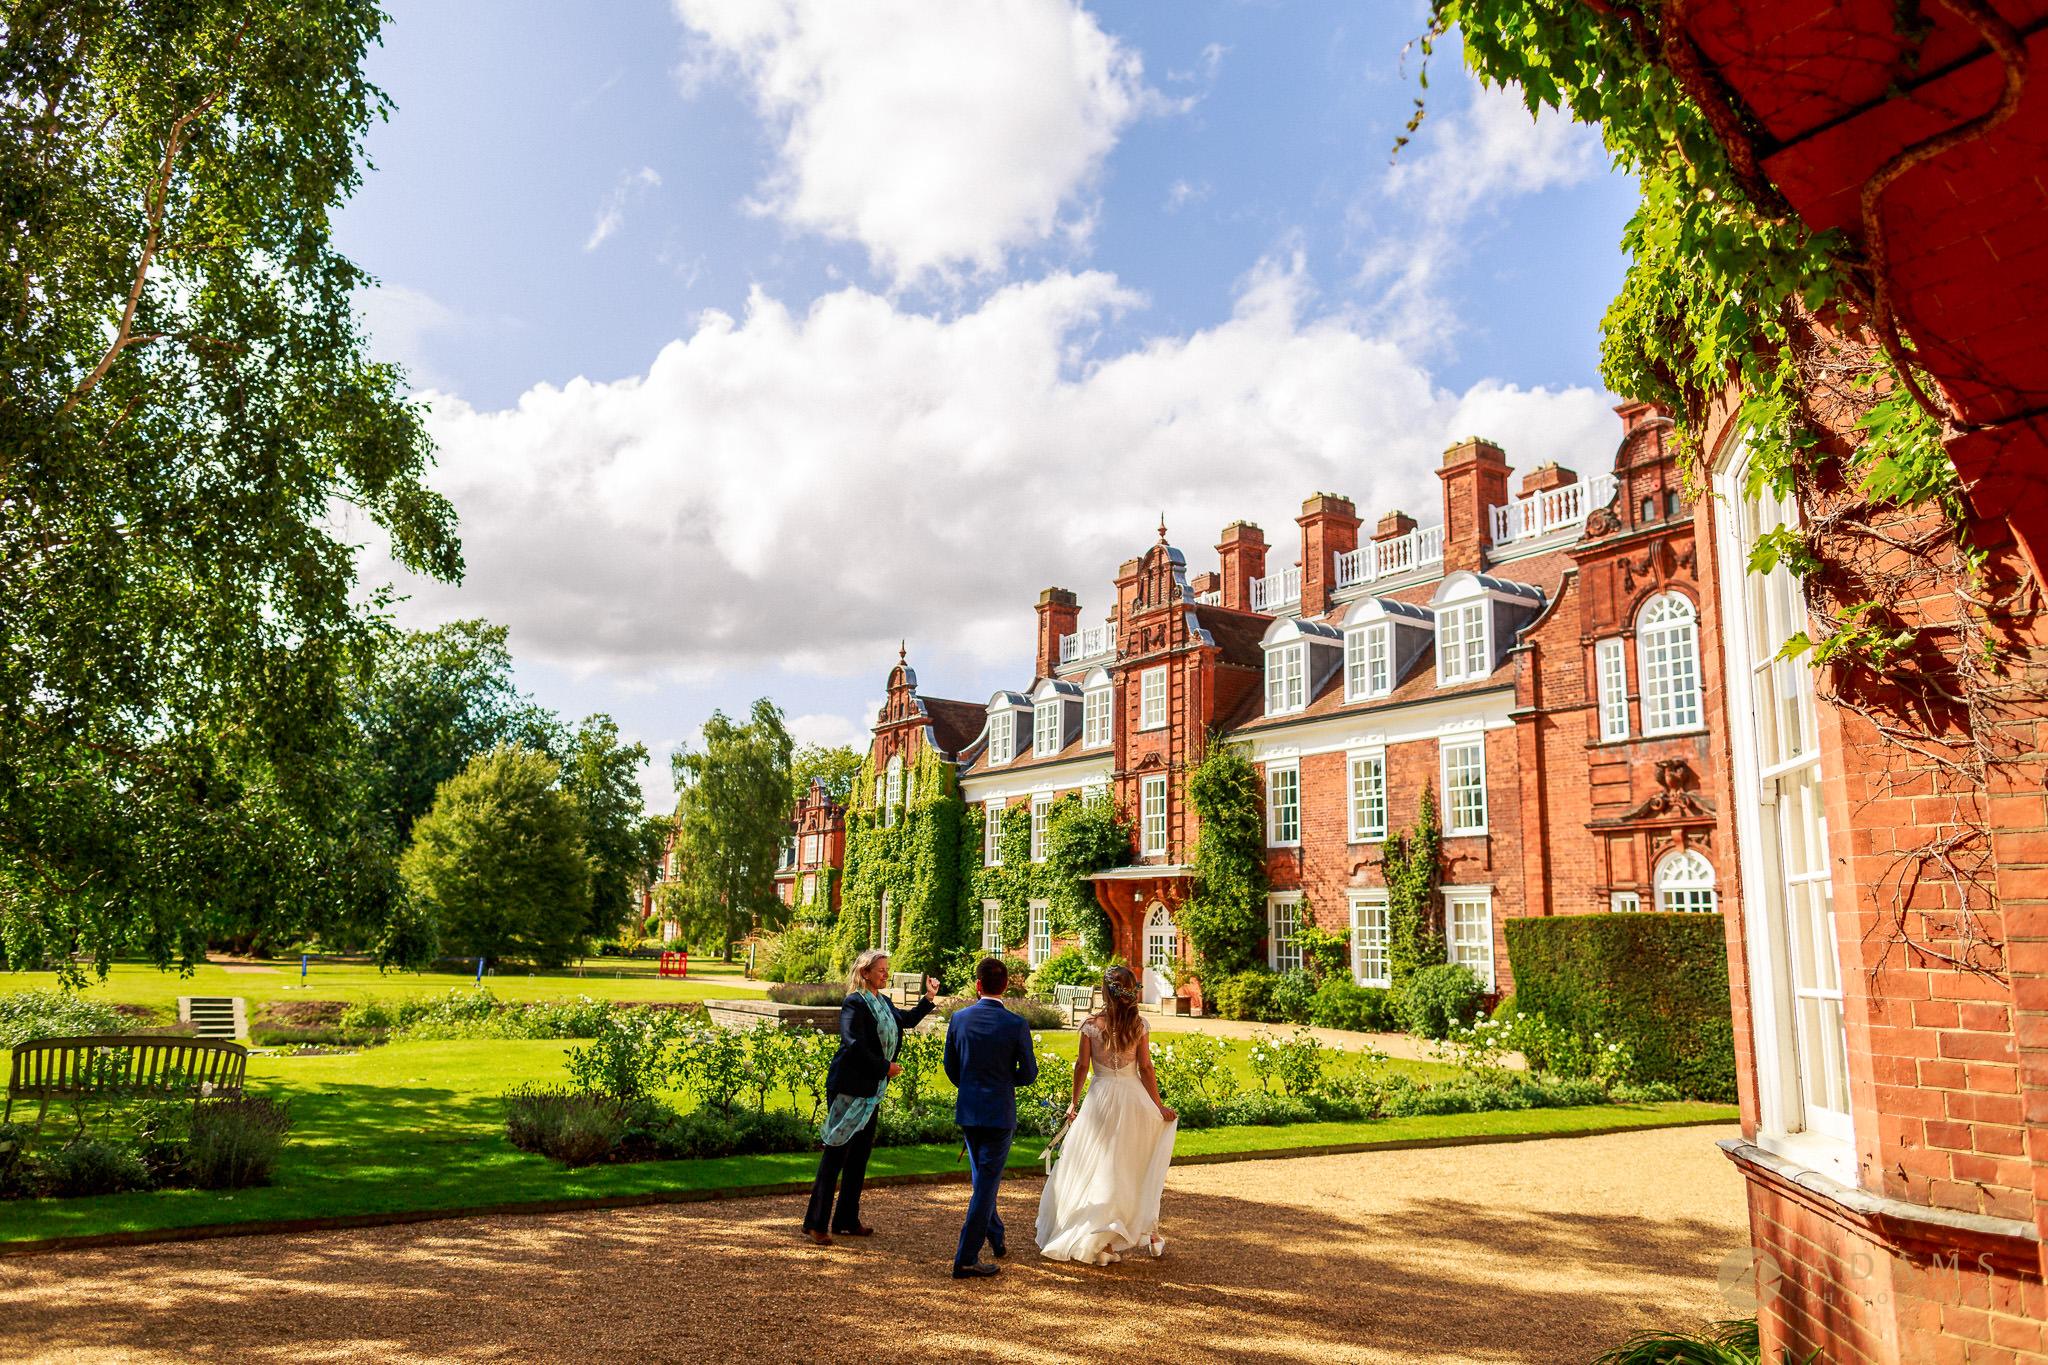 Cambridge Photographer bride and groom arrive to Newnham College